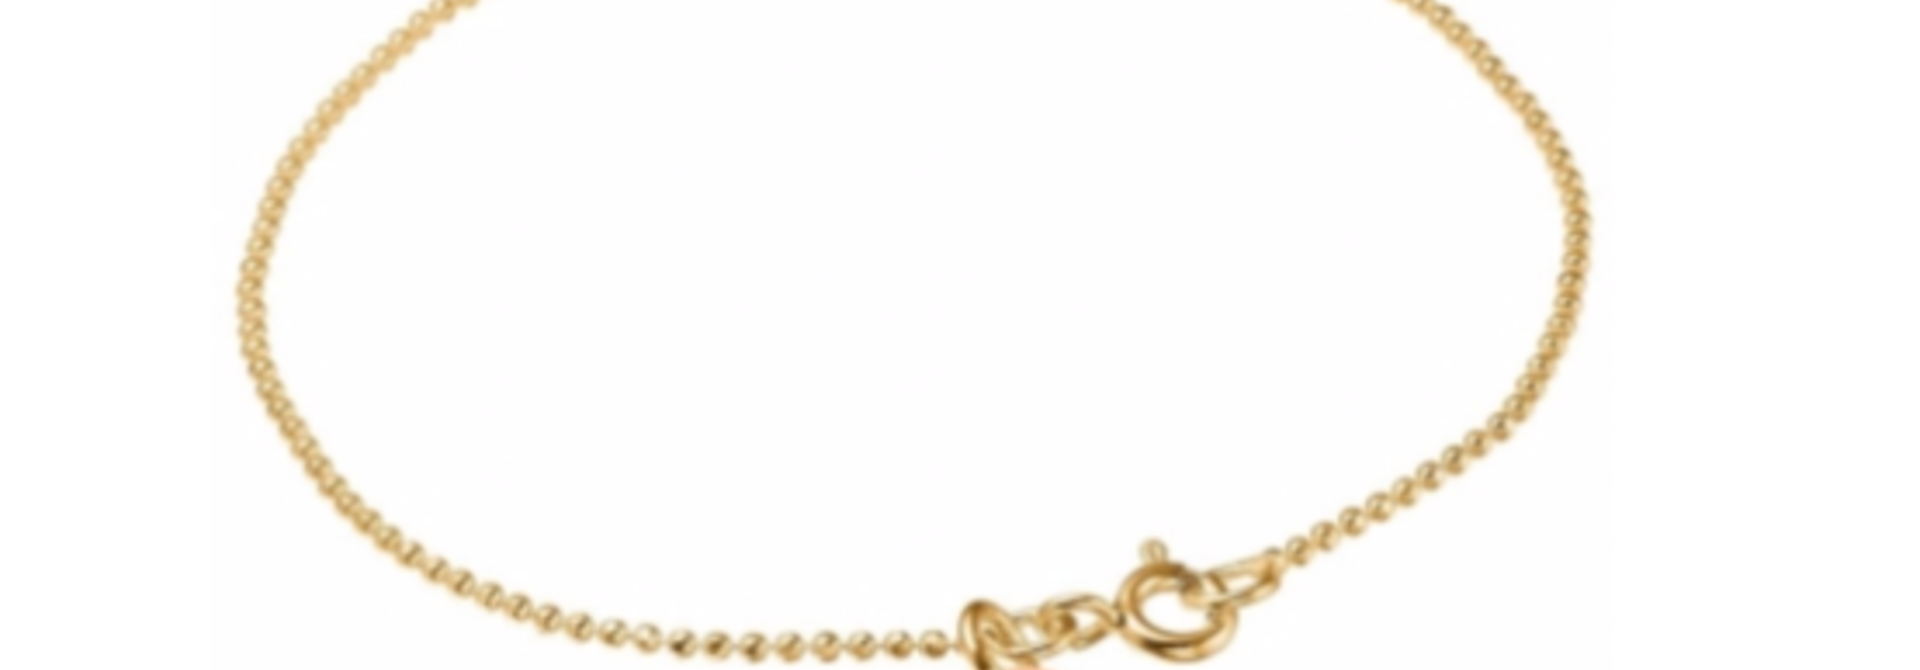 Bracelet ball chain clementine